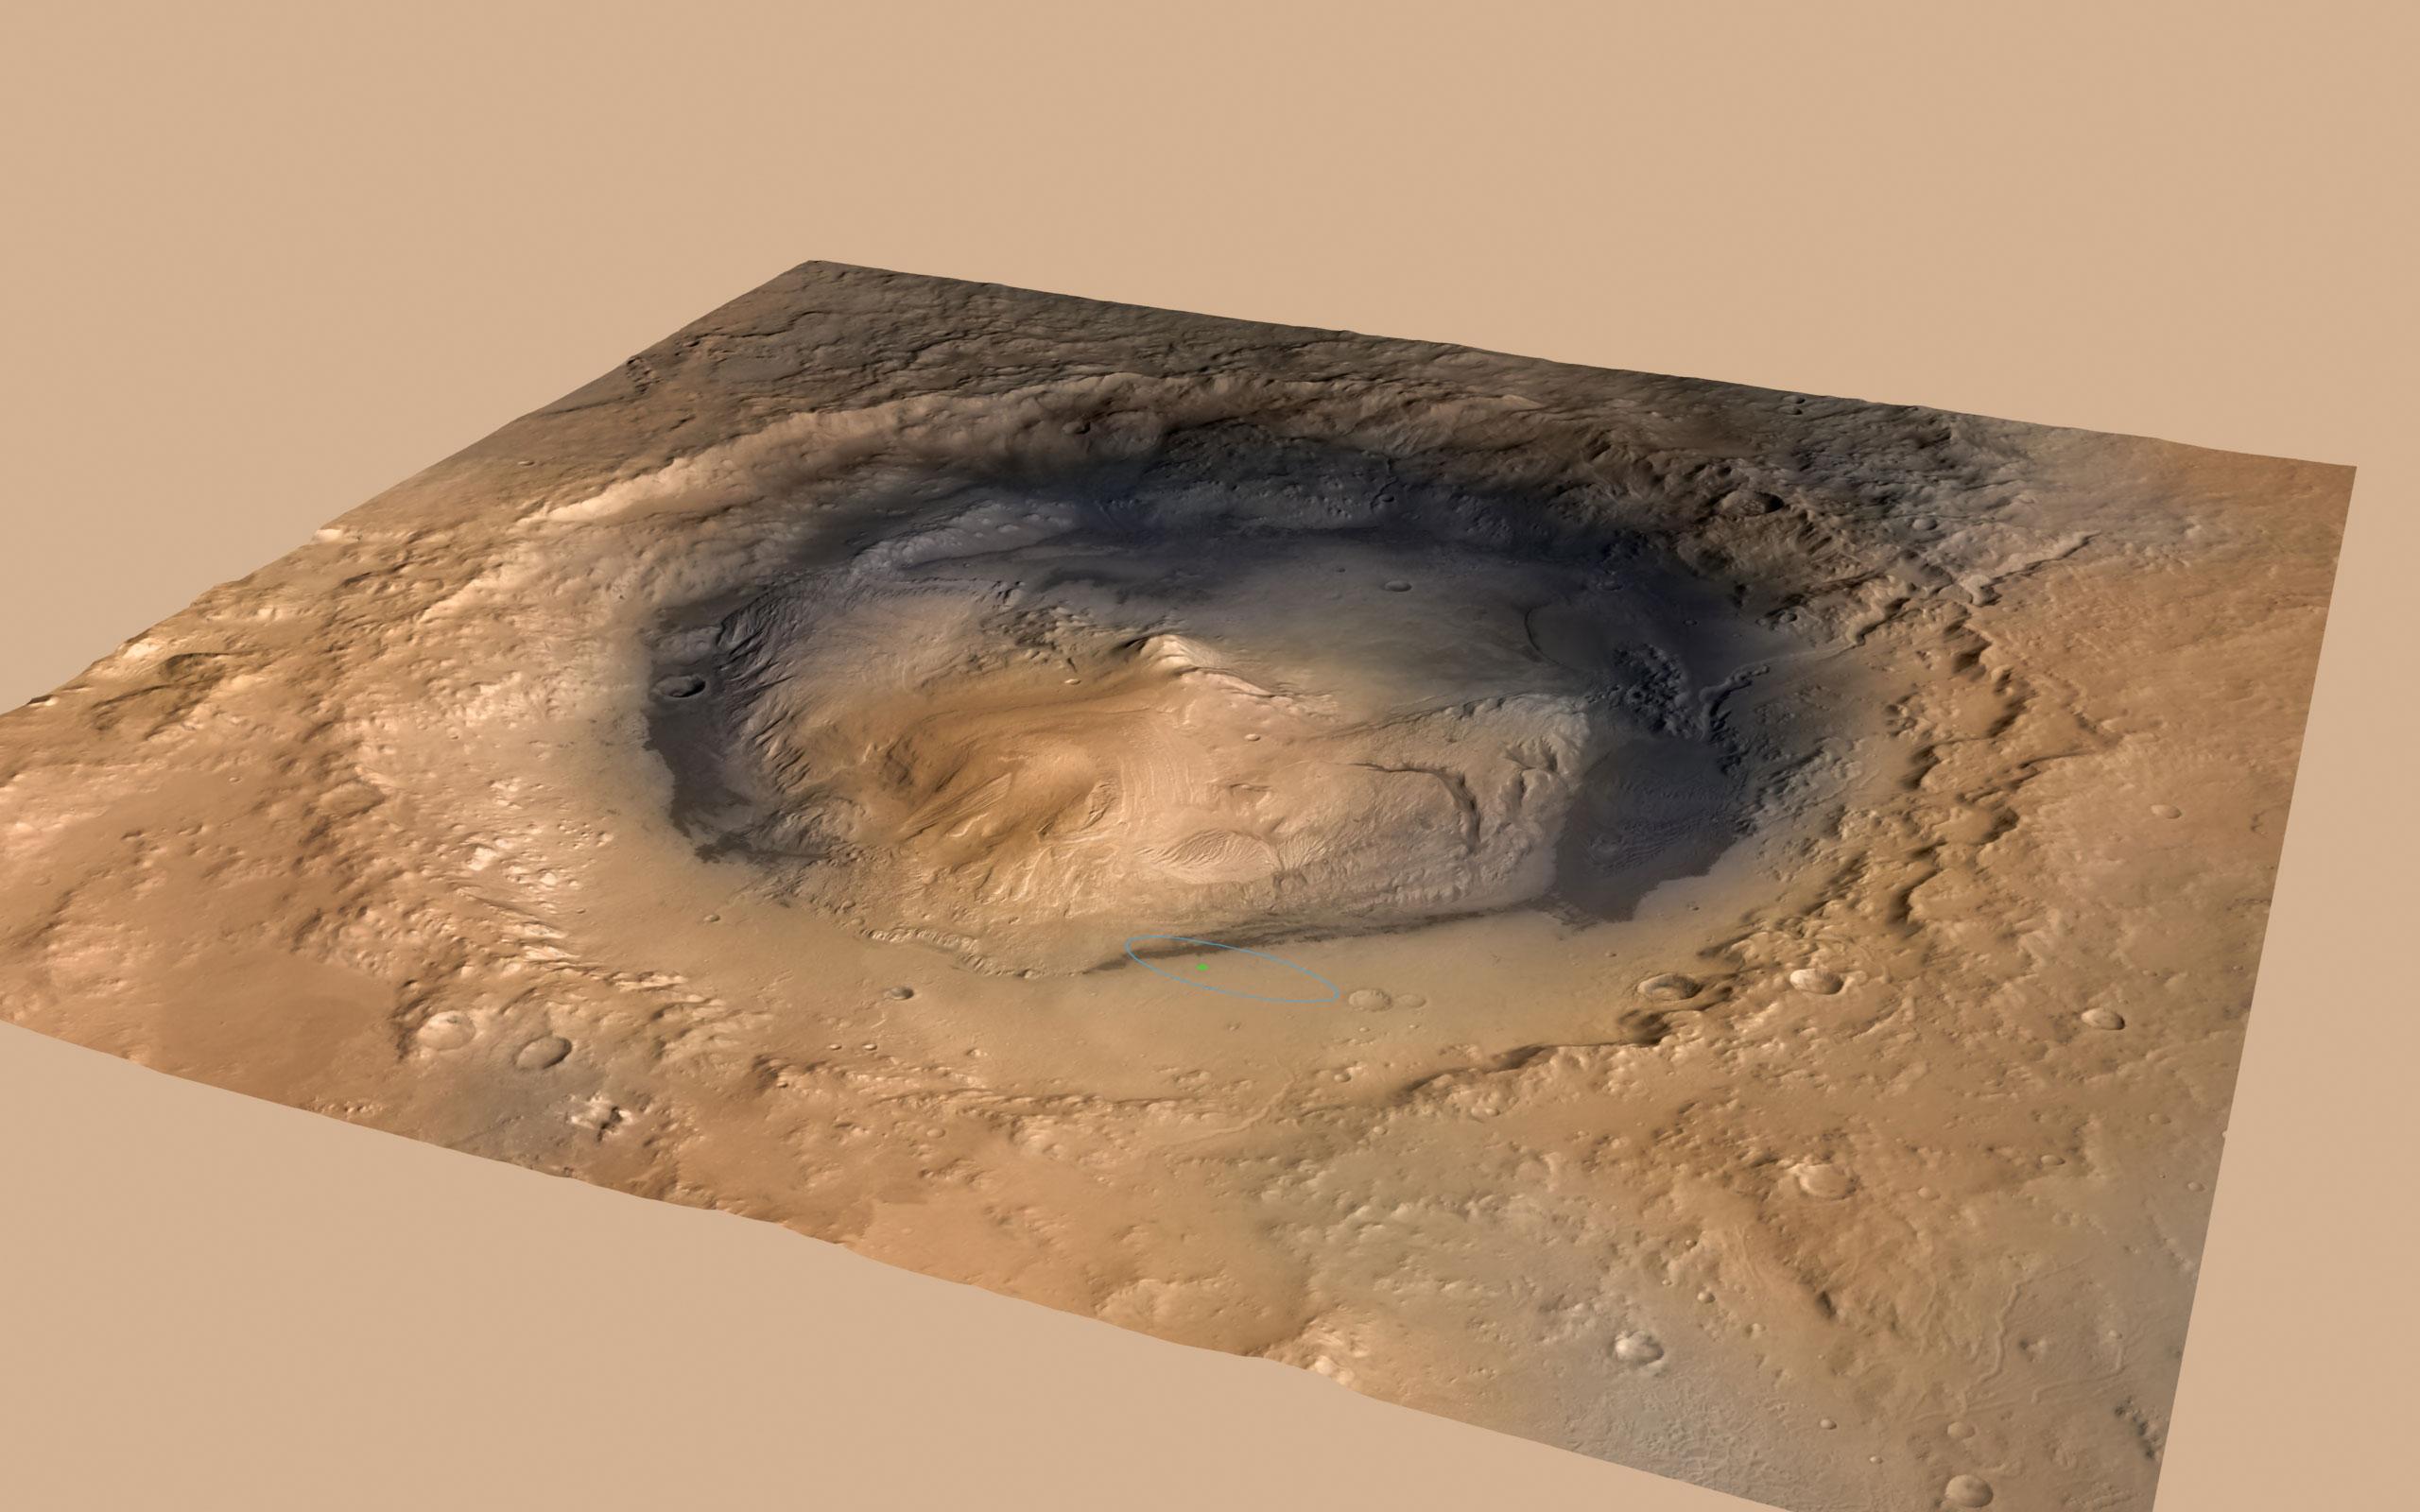 Mars-curiosity-3